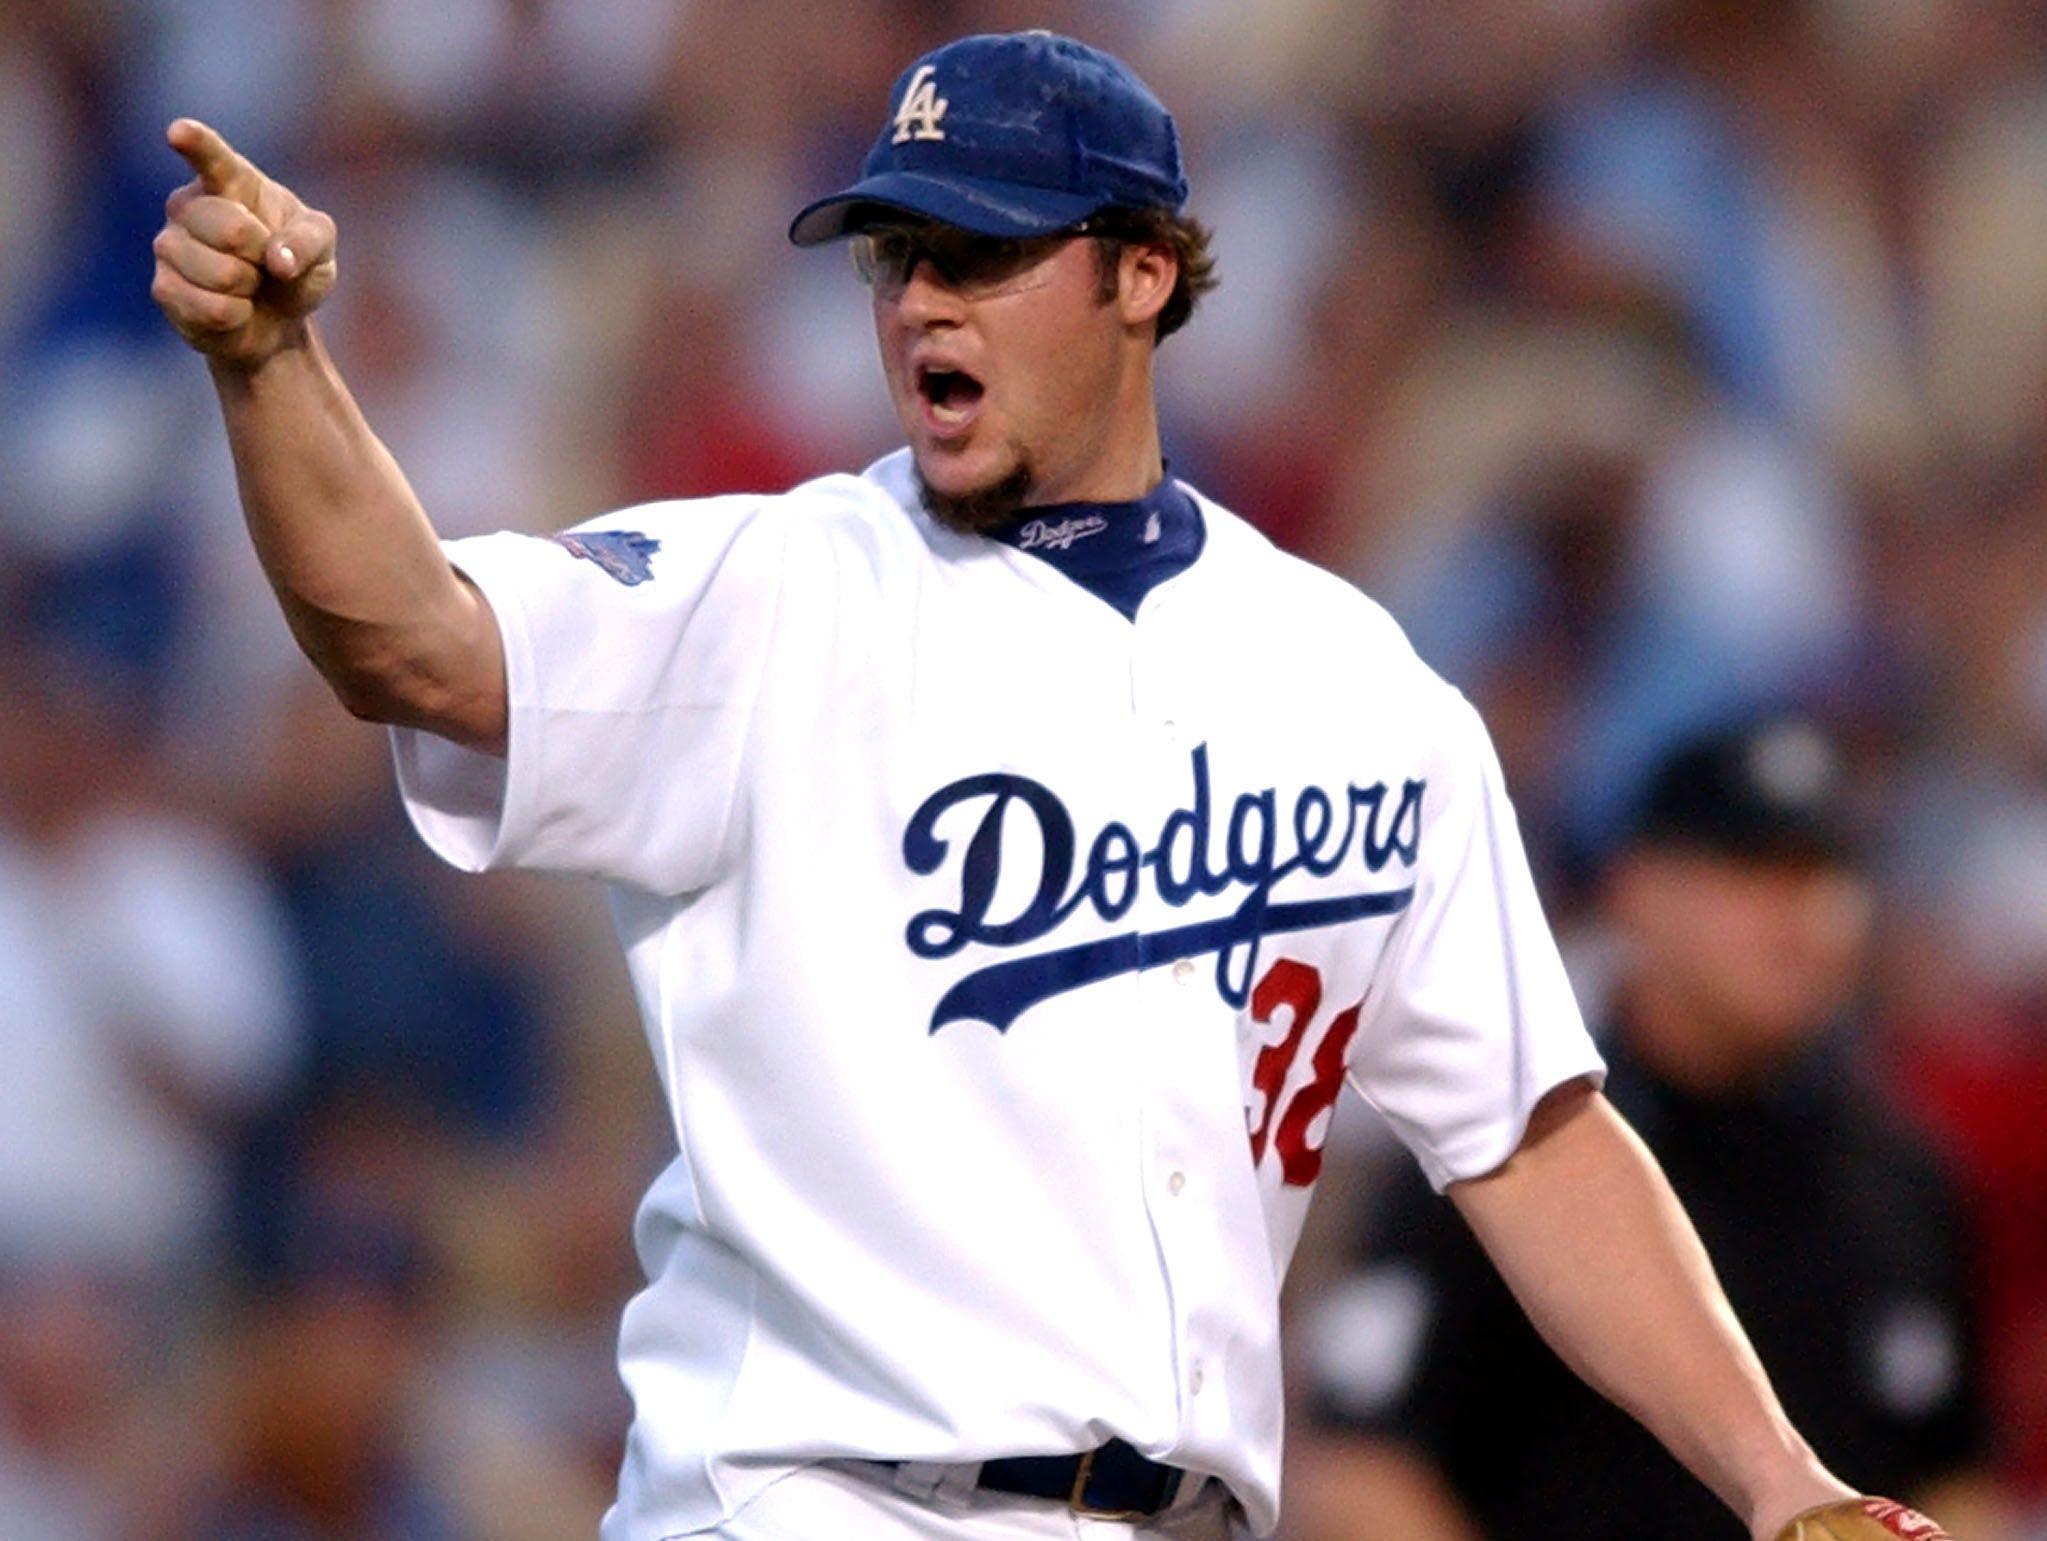 52 – Eric Gagne, Dodgers, 2002